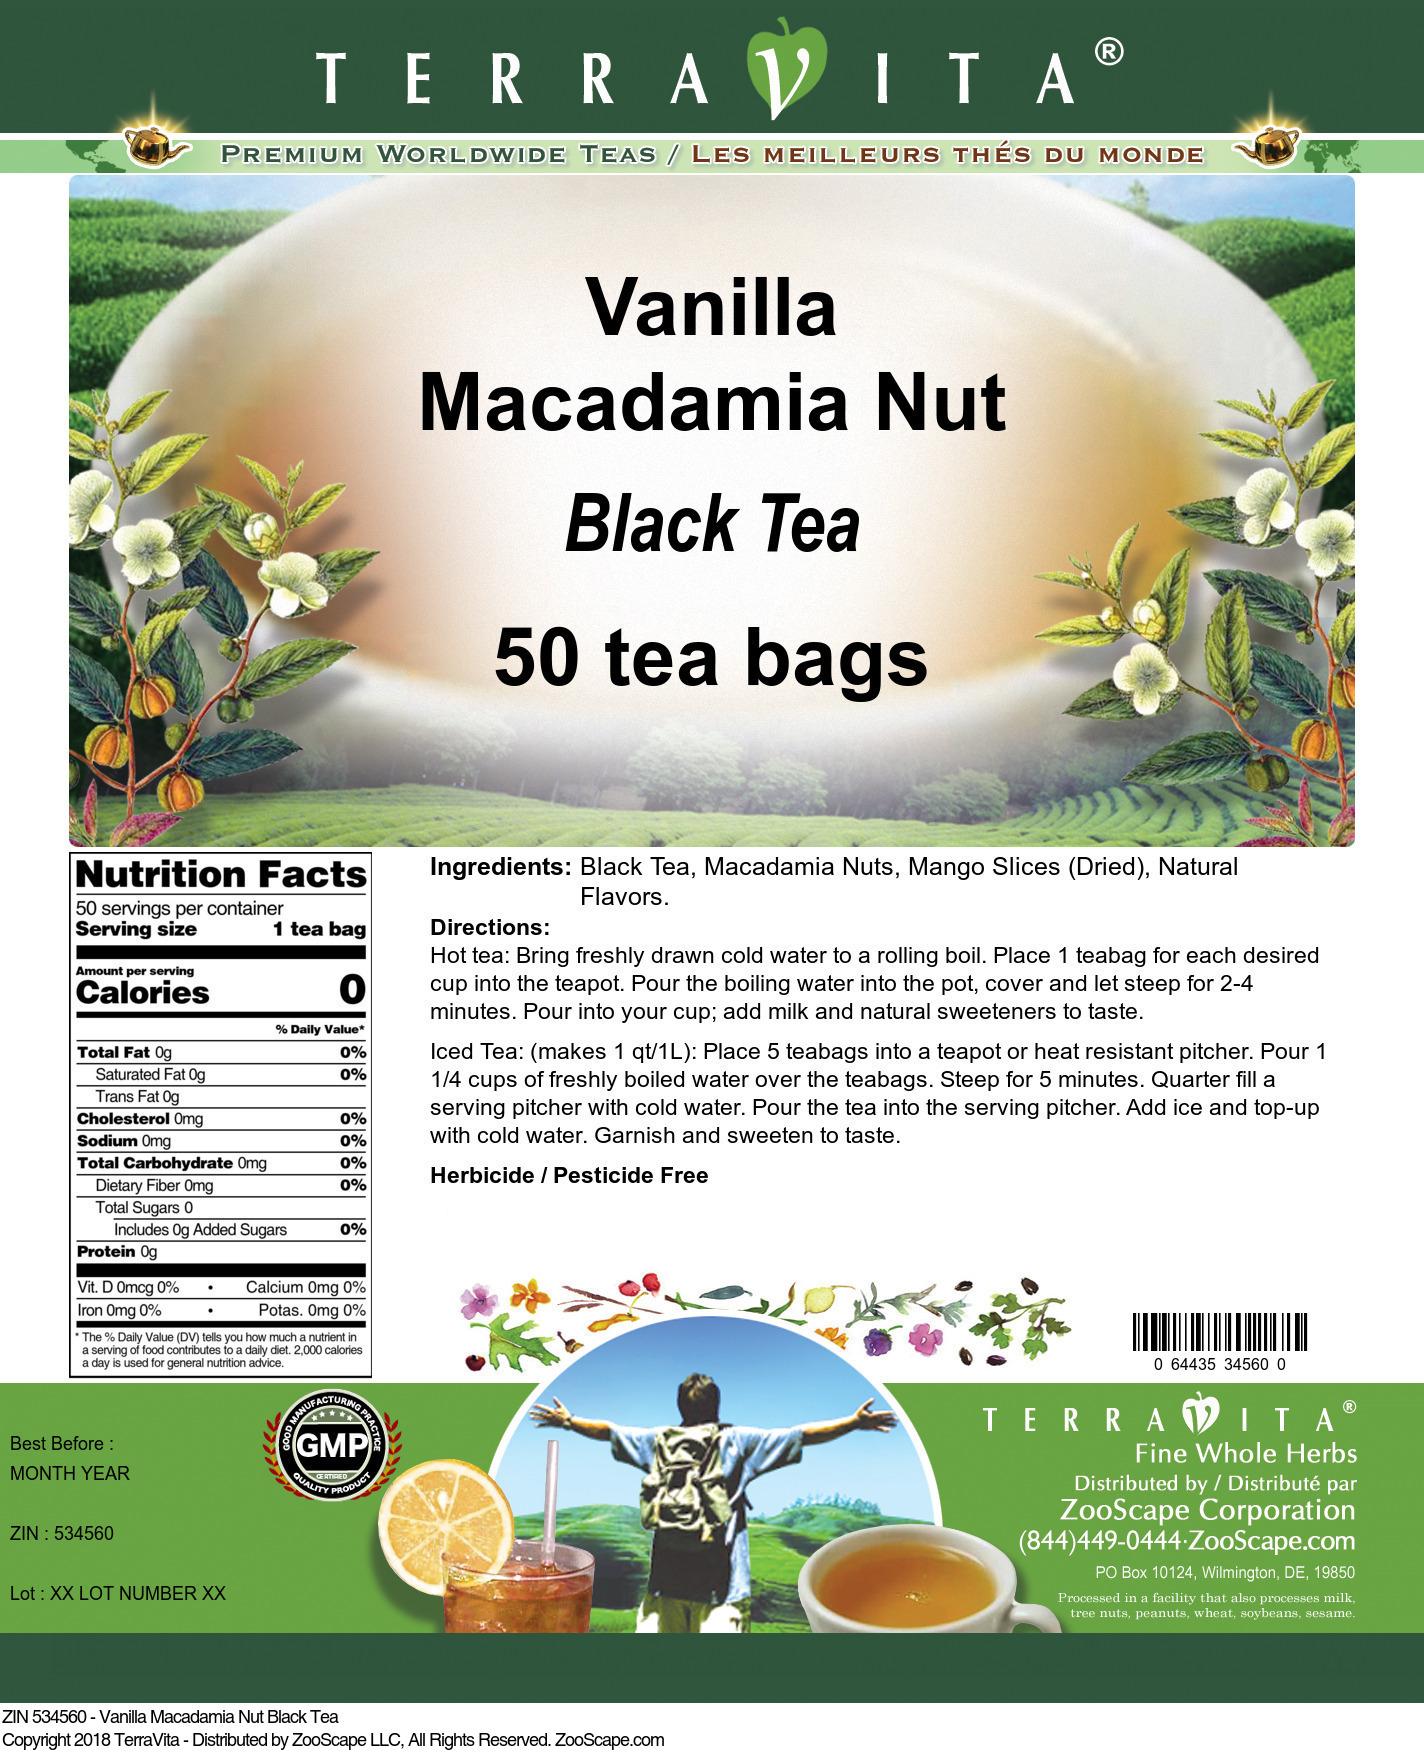 Vanilla Macadamia Nut Black Tea